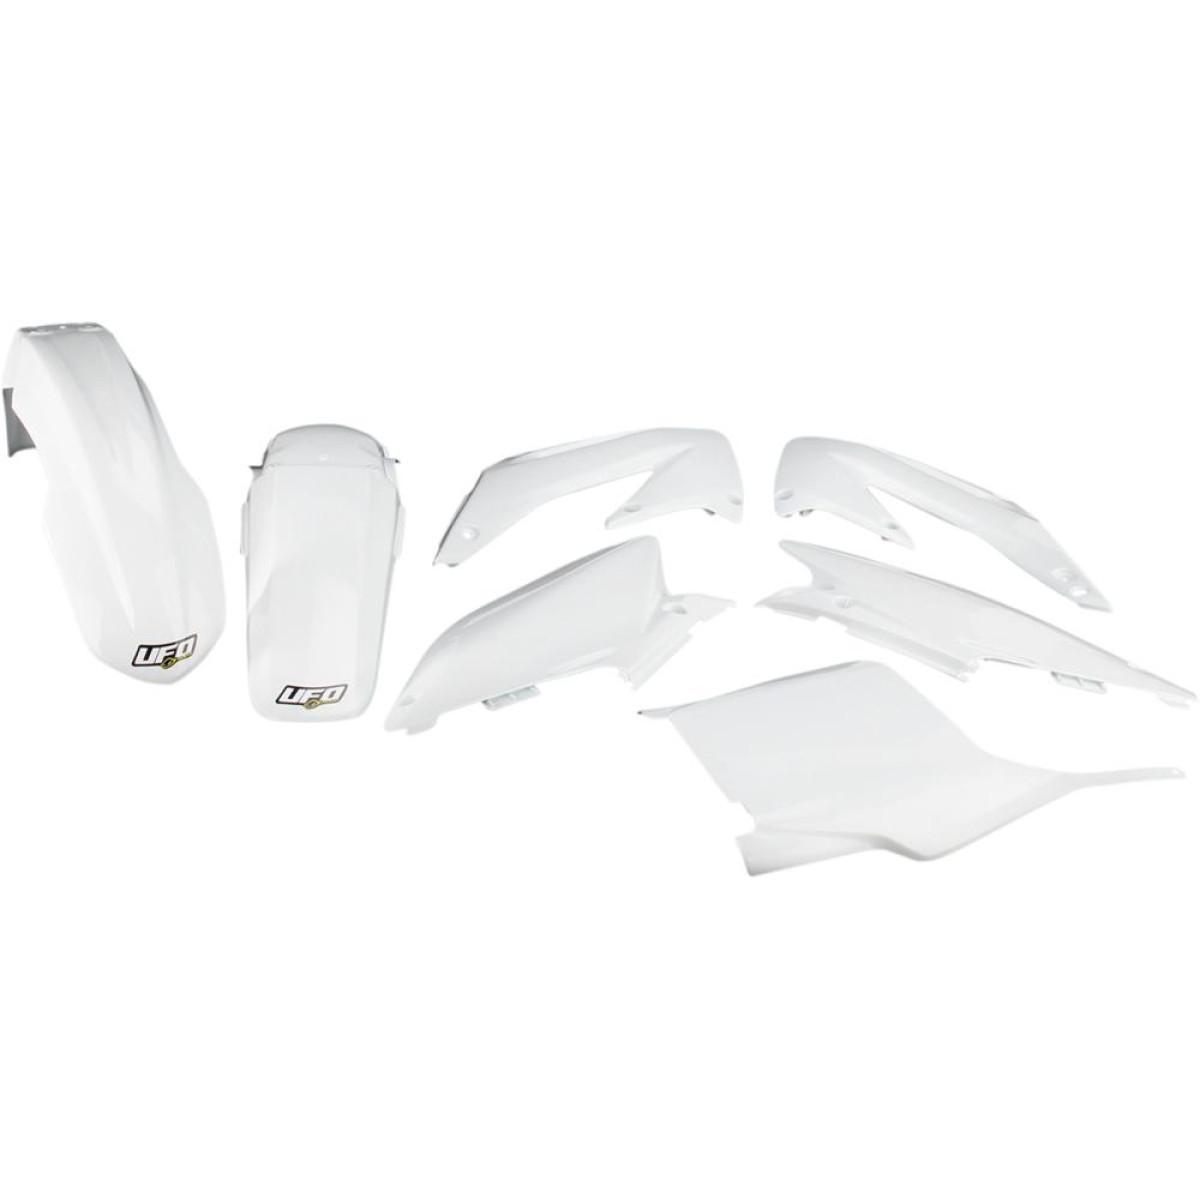 Kit plastique UFO Honda CR 125R 05-07 blanc